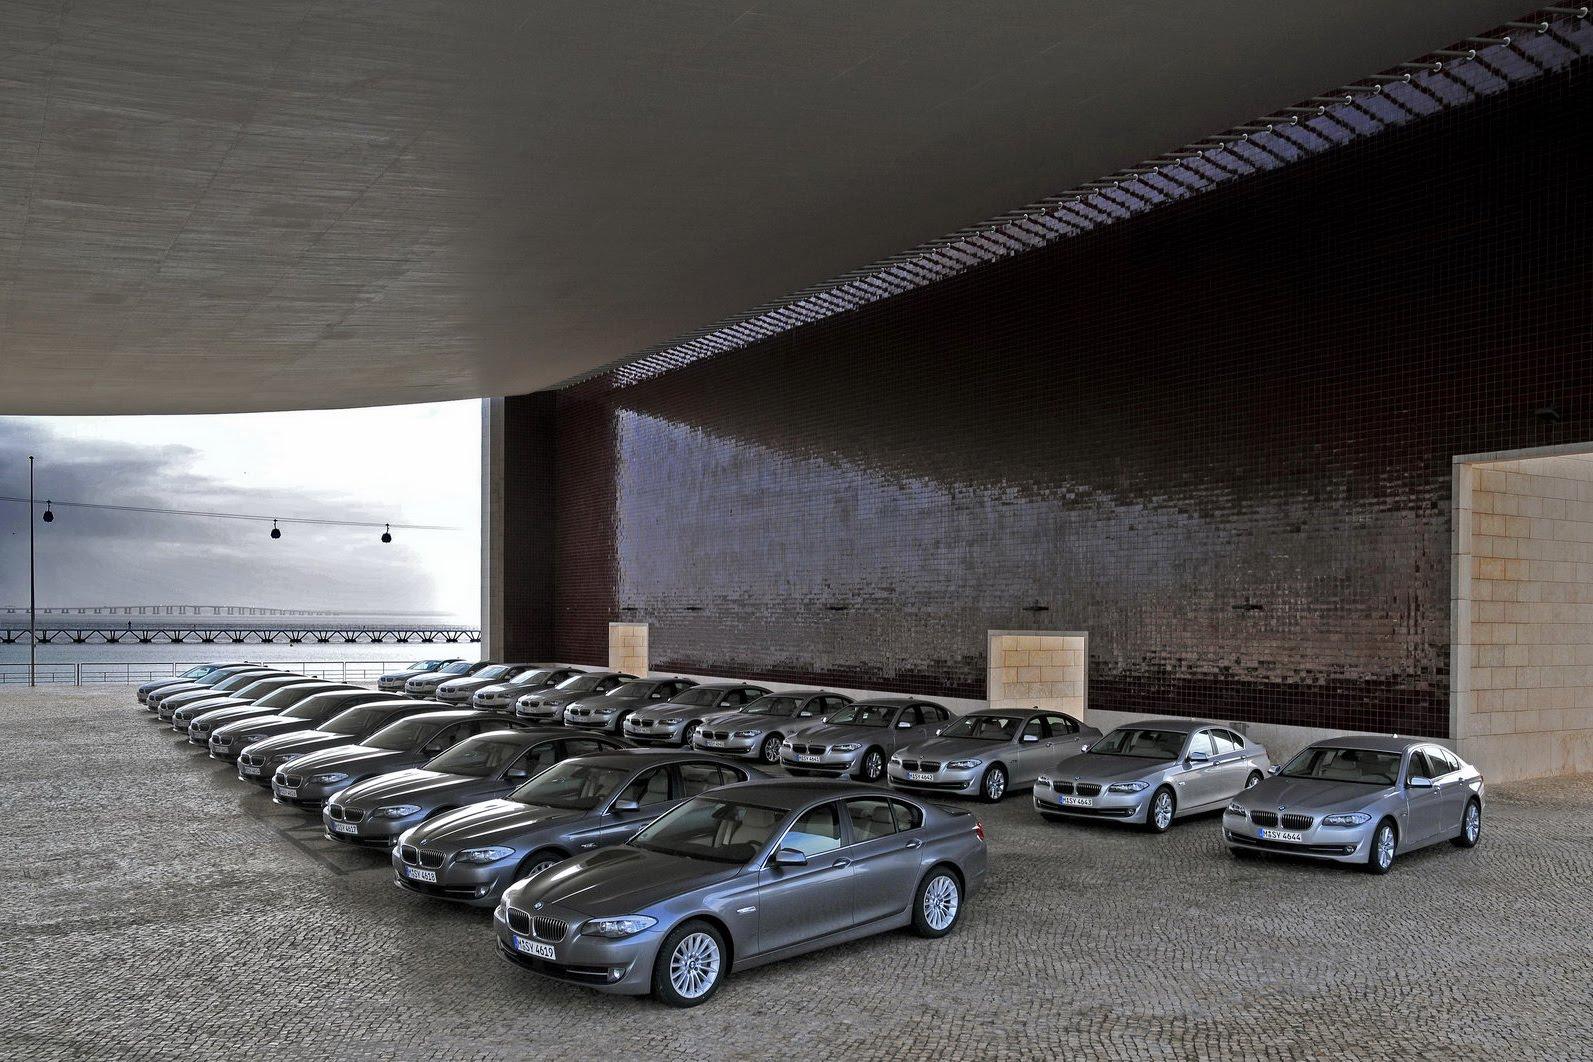 2011 BMW 5 Series Lineup